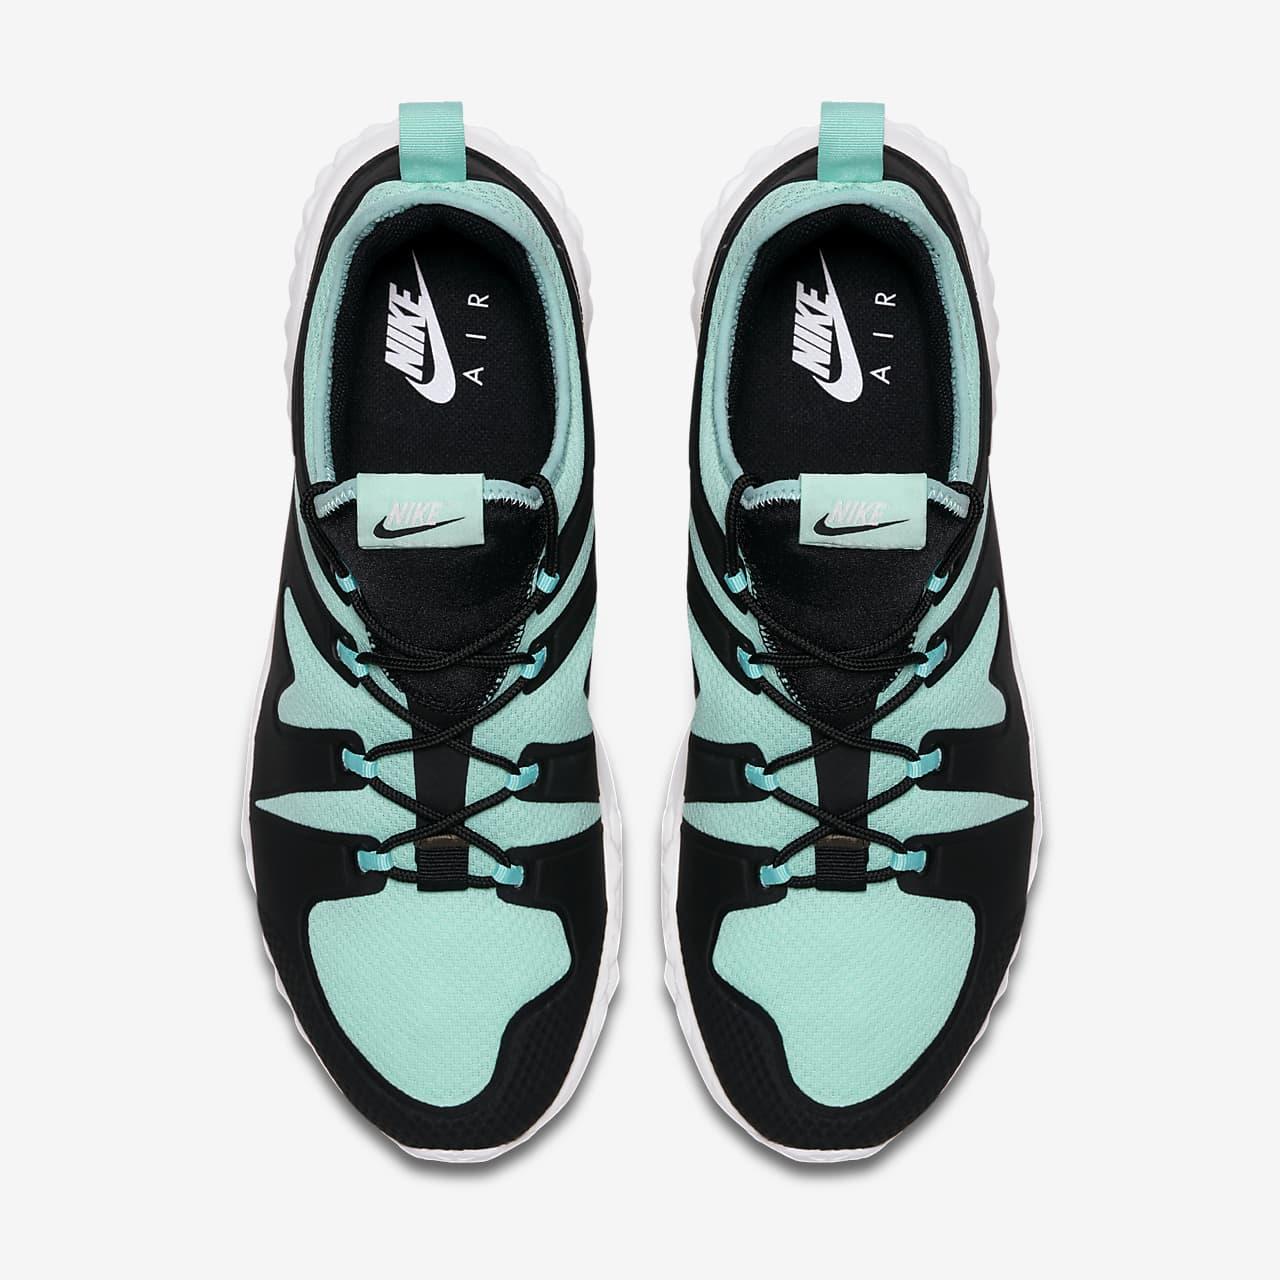 Inibire boicottare Ape  Nike Air Zoom LWP '16 SP Men's Shoe. Nike LU